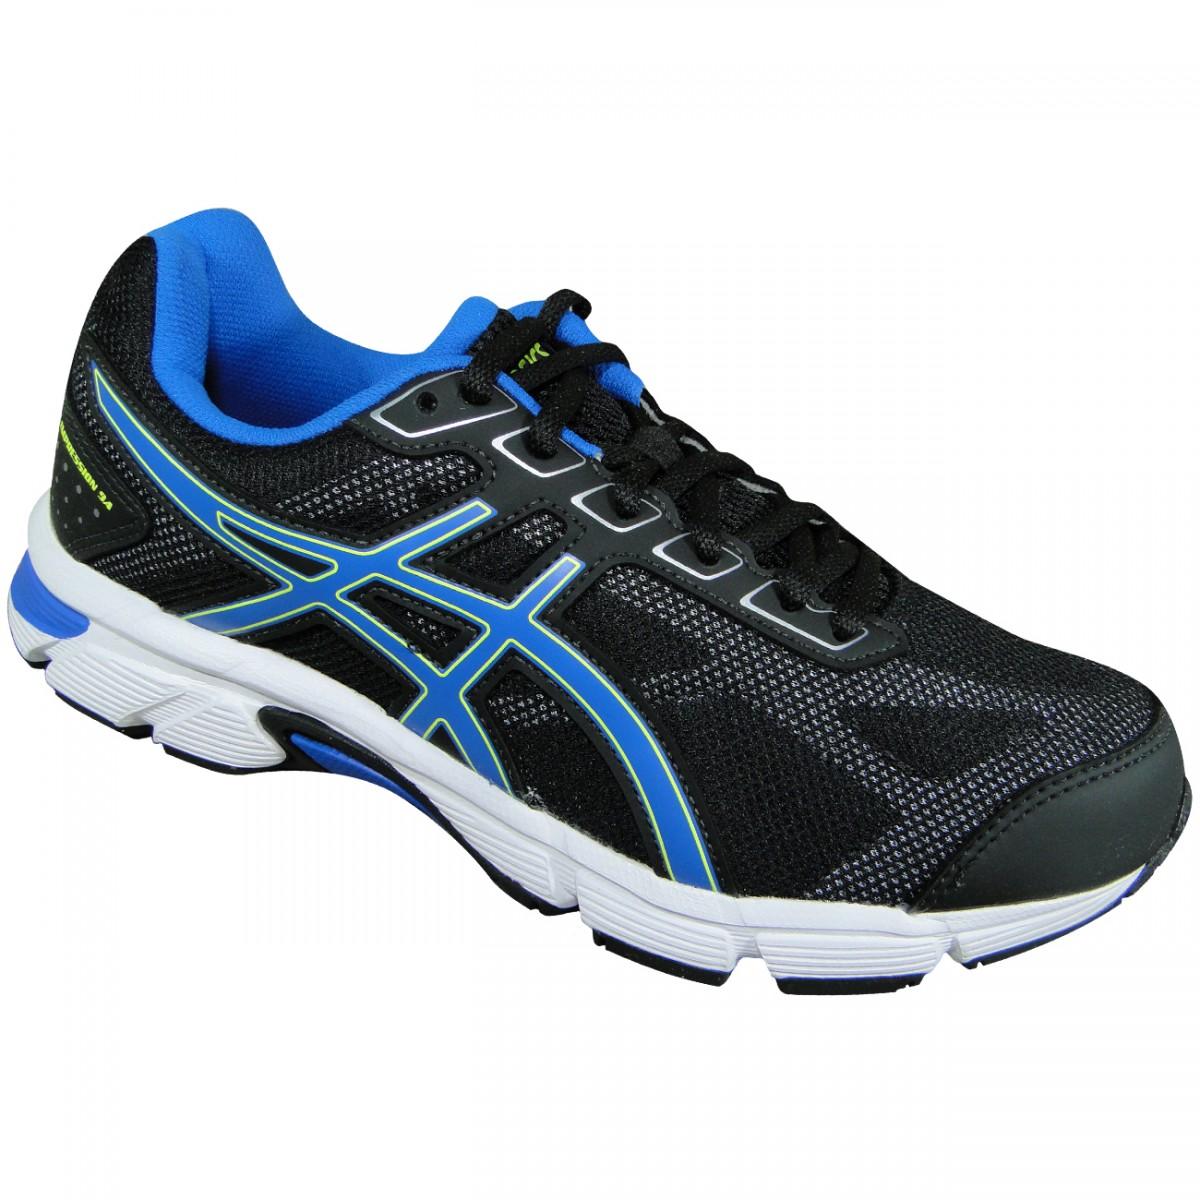 5c7a4fc7d14 Tenis Asics Gel-Impression 9 T021A 9039 - Preto Azul Branco - Chuteira  Nike